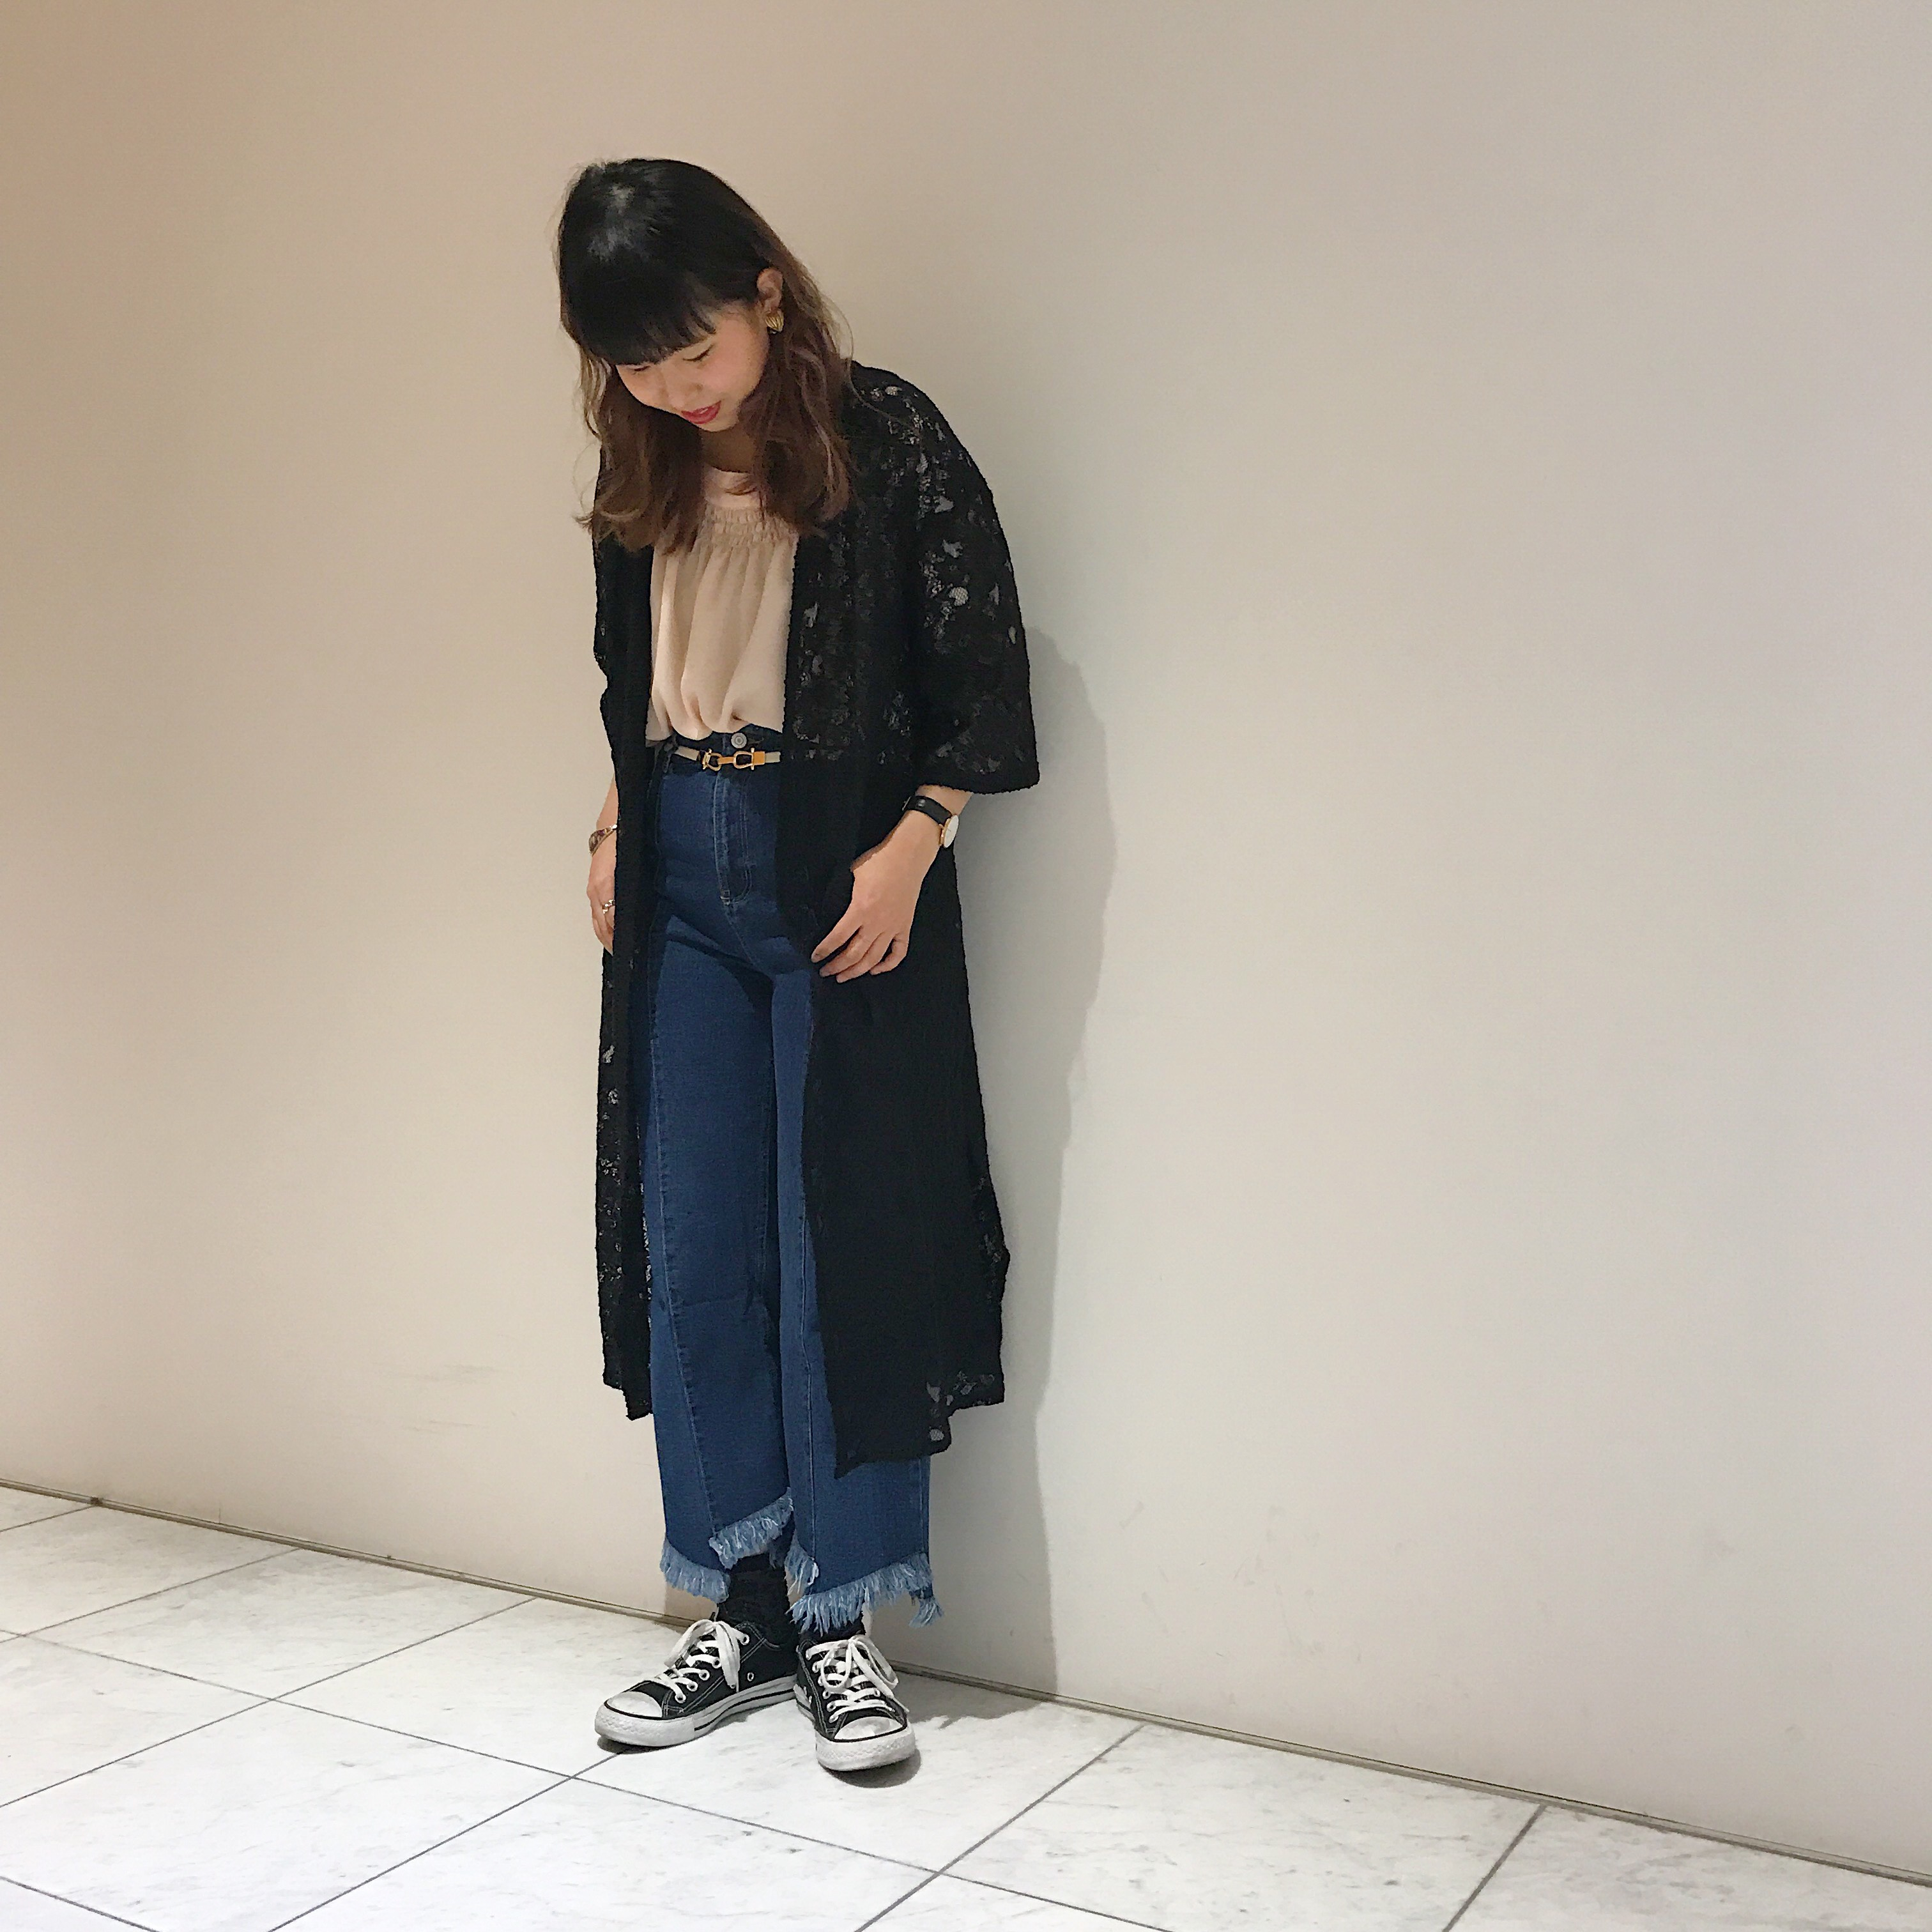 fc2blog_20170316152408a05.jpg